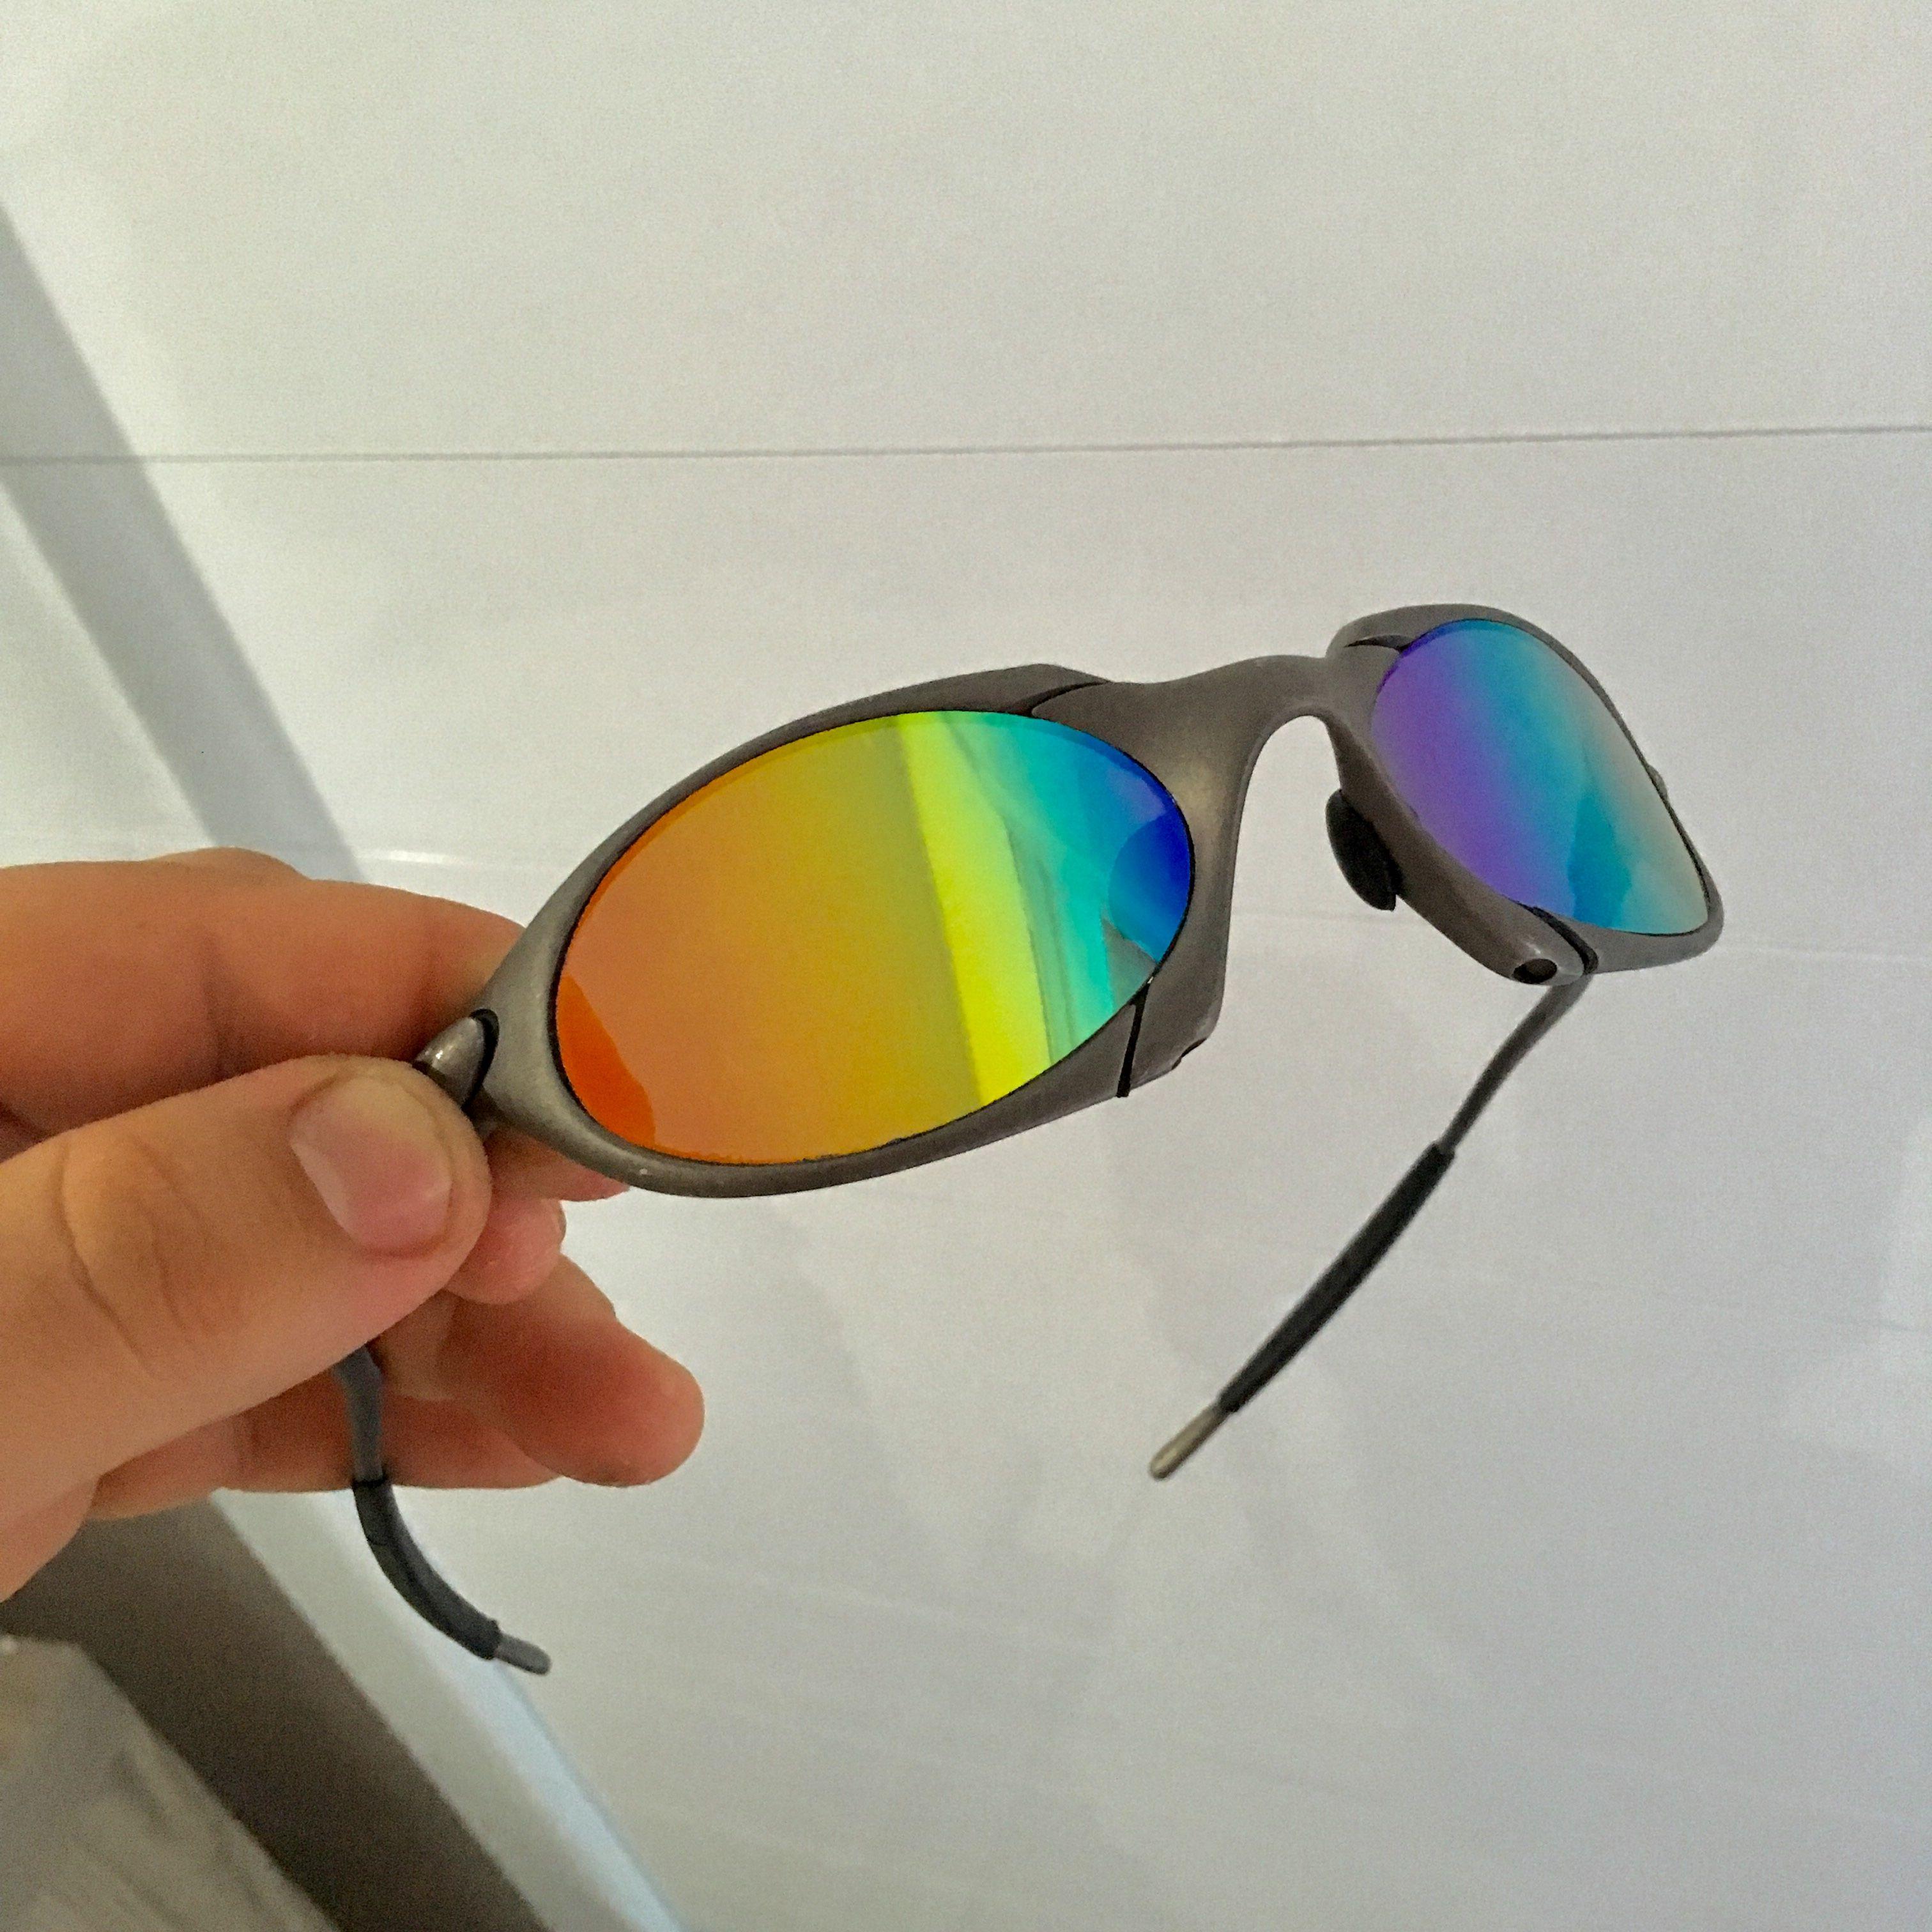 83f315cf7 Romeo 1 Xmetal, lentes arco-iris | lentes01 in 2019 | Óculos, Oculos ...